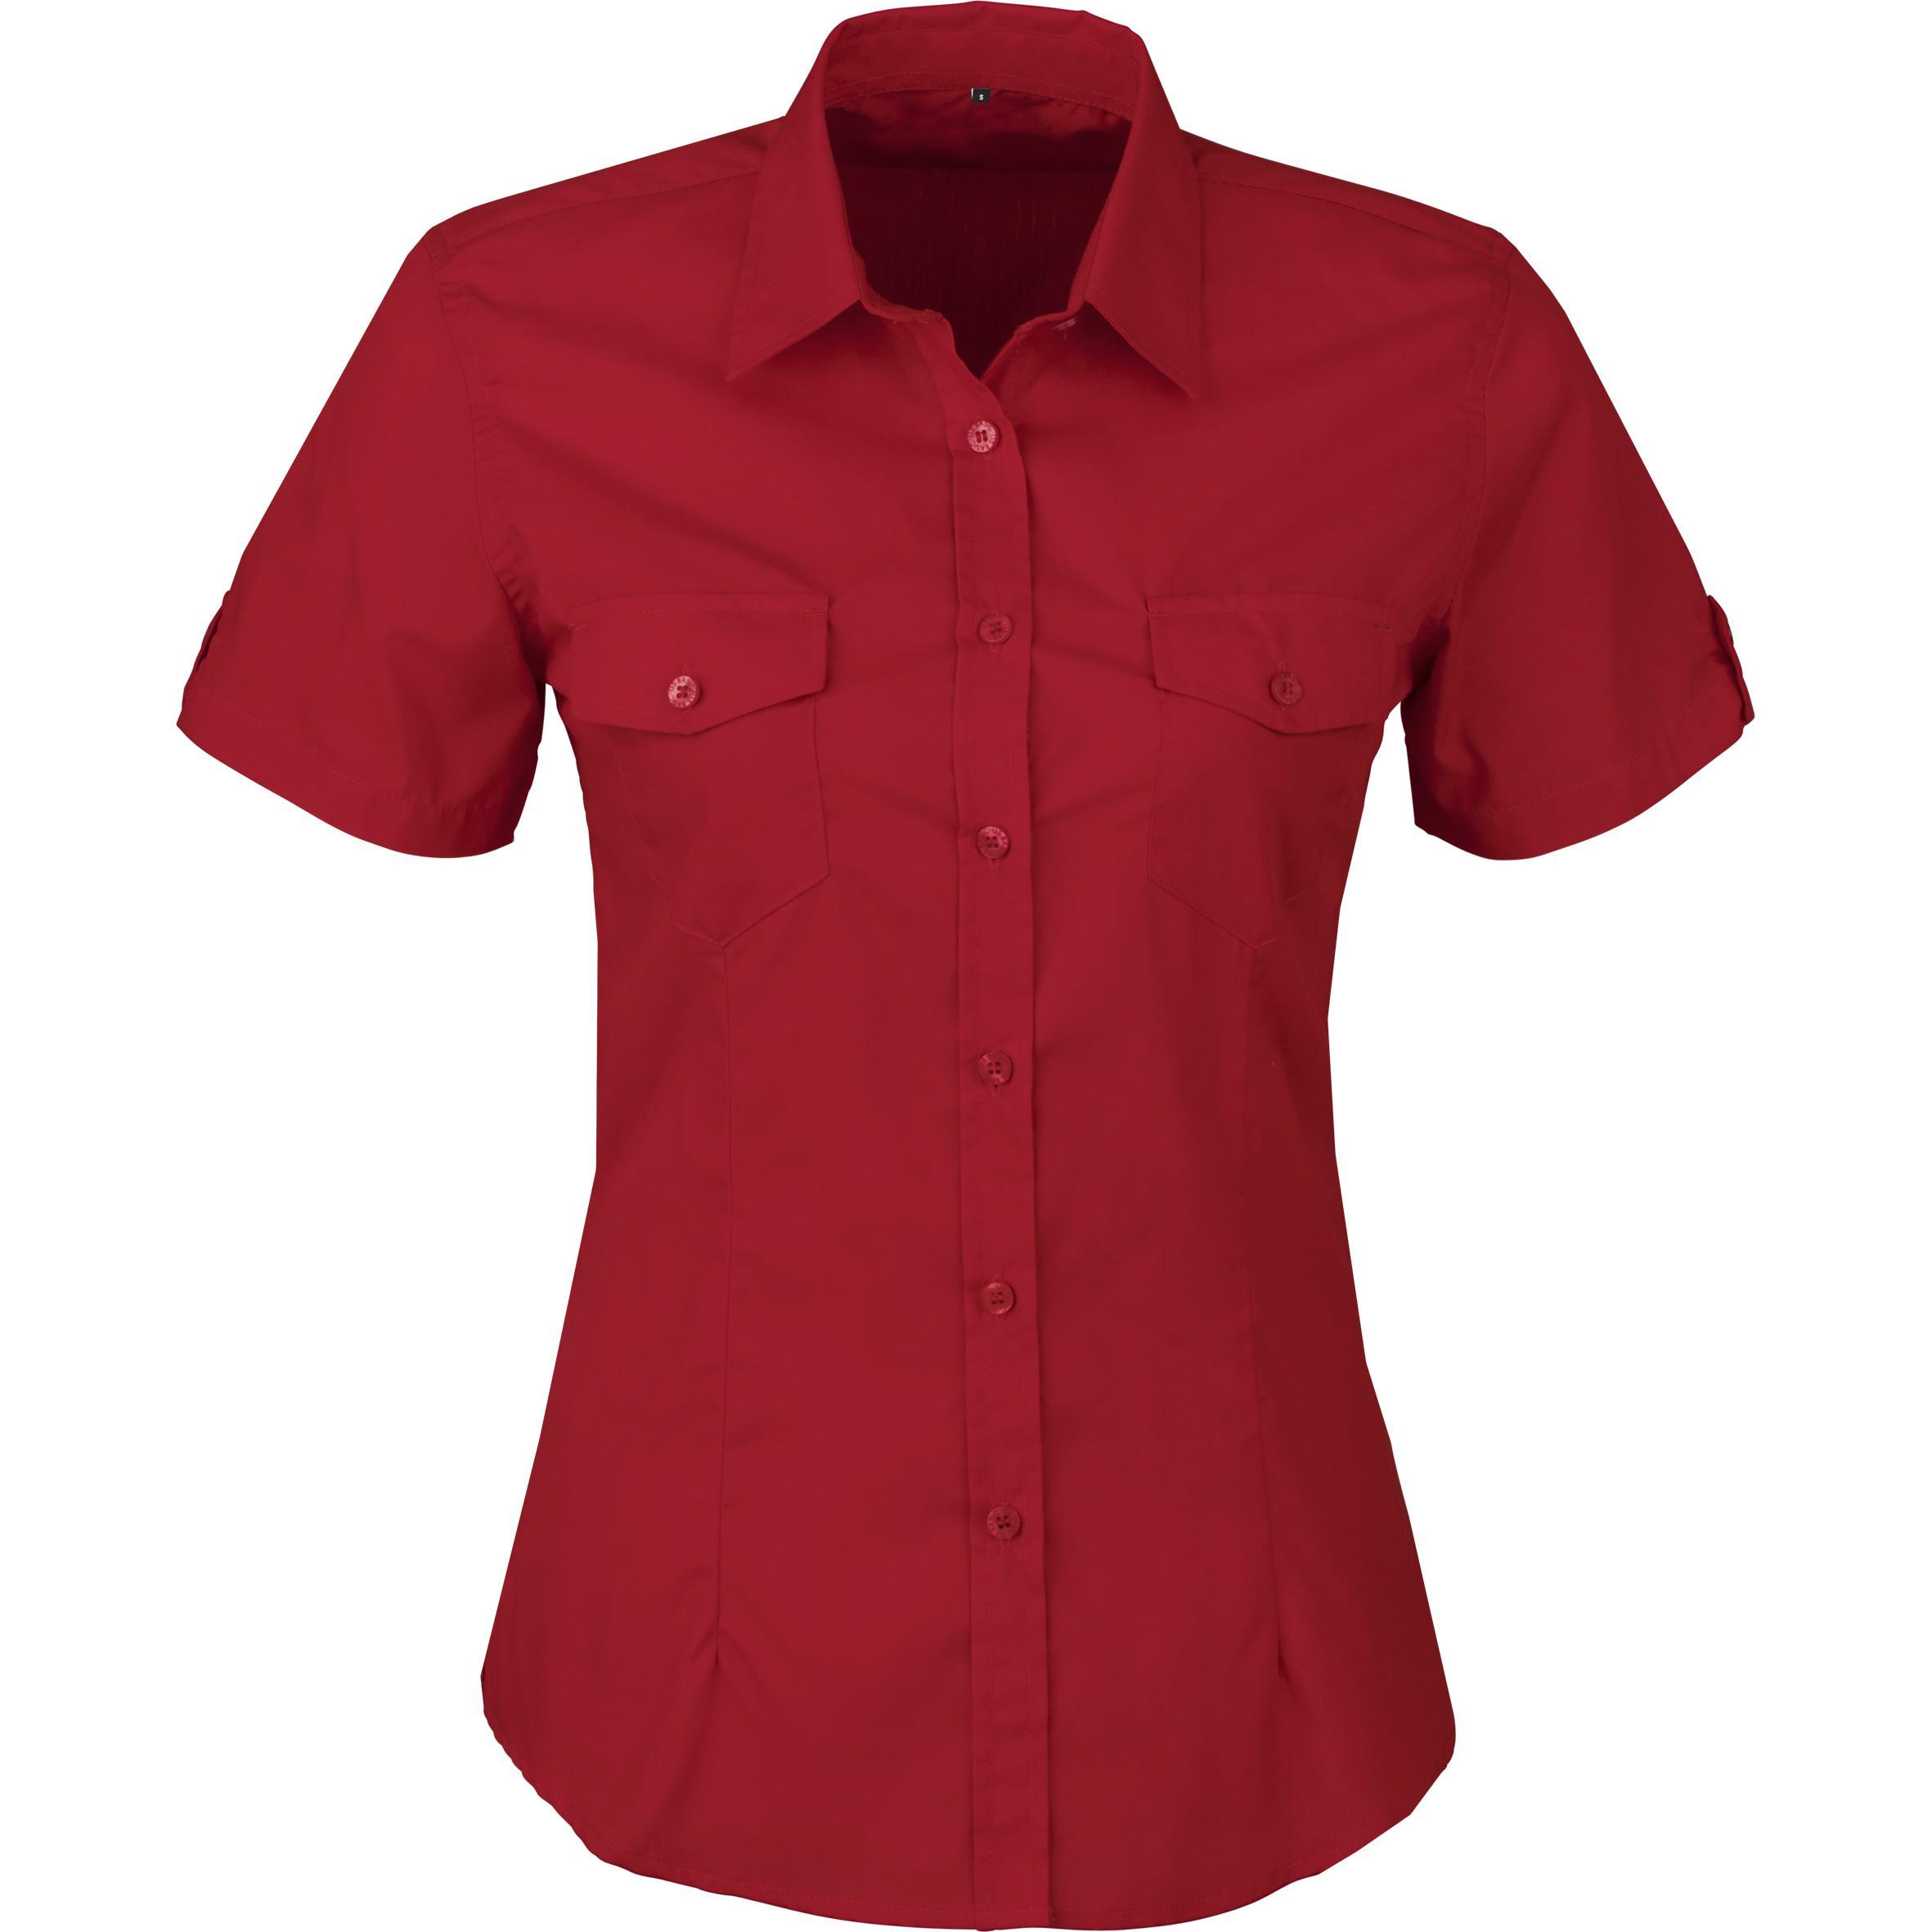 Ladies Short Sleeve Kensington Shirt - Red Only